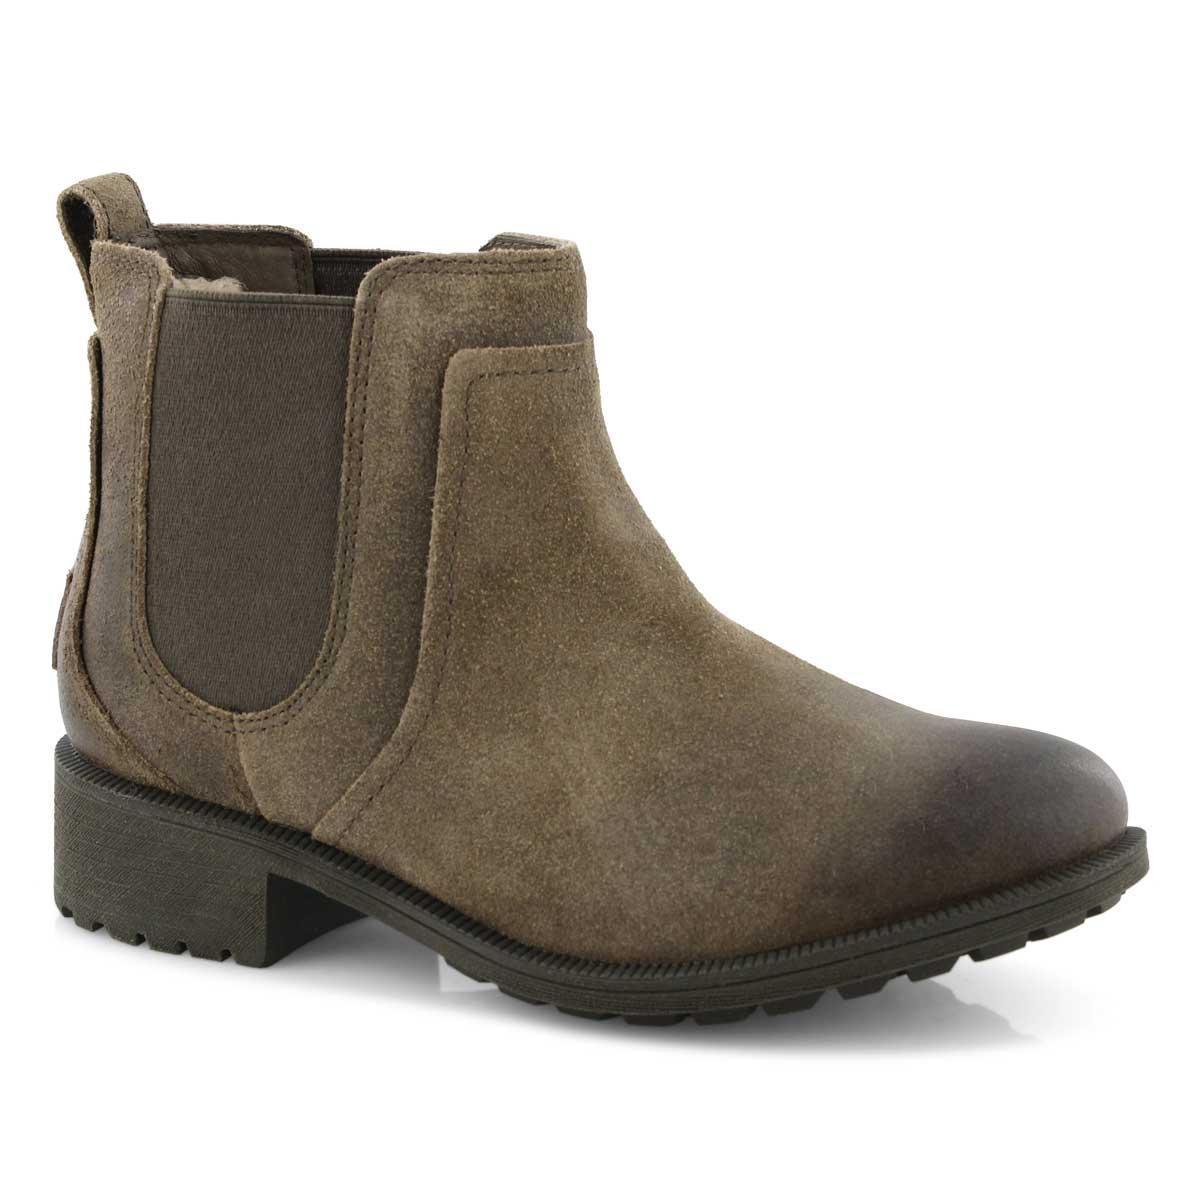 5b2c44e427c Women's BONHAM II dove waterproof chelsea boots